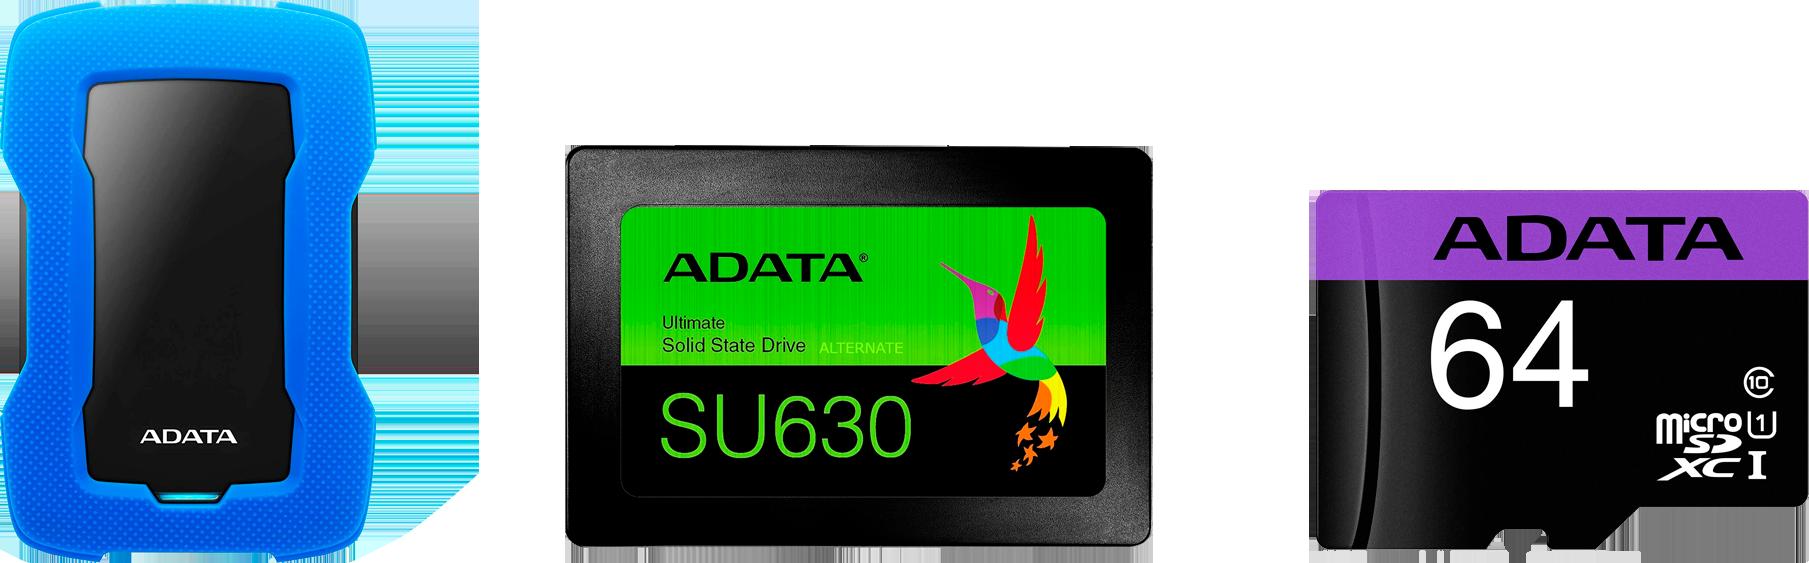 ADATA Data Recovery